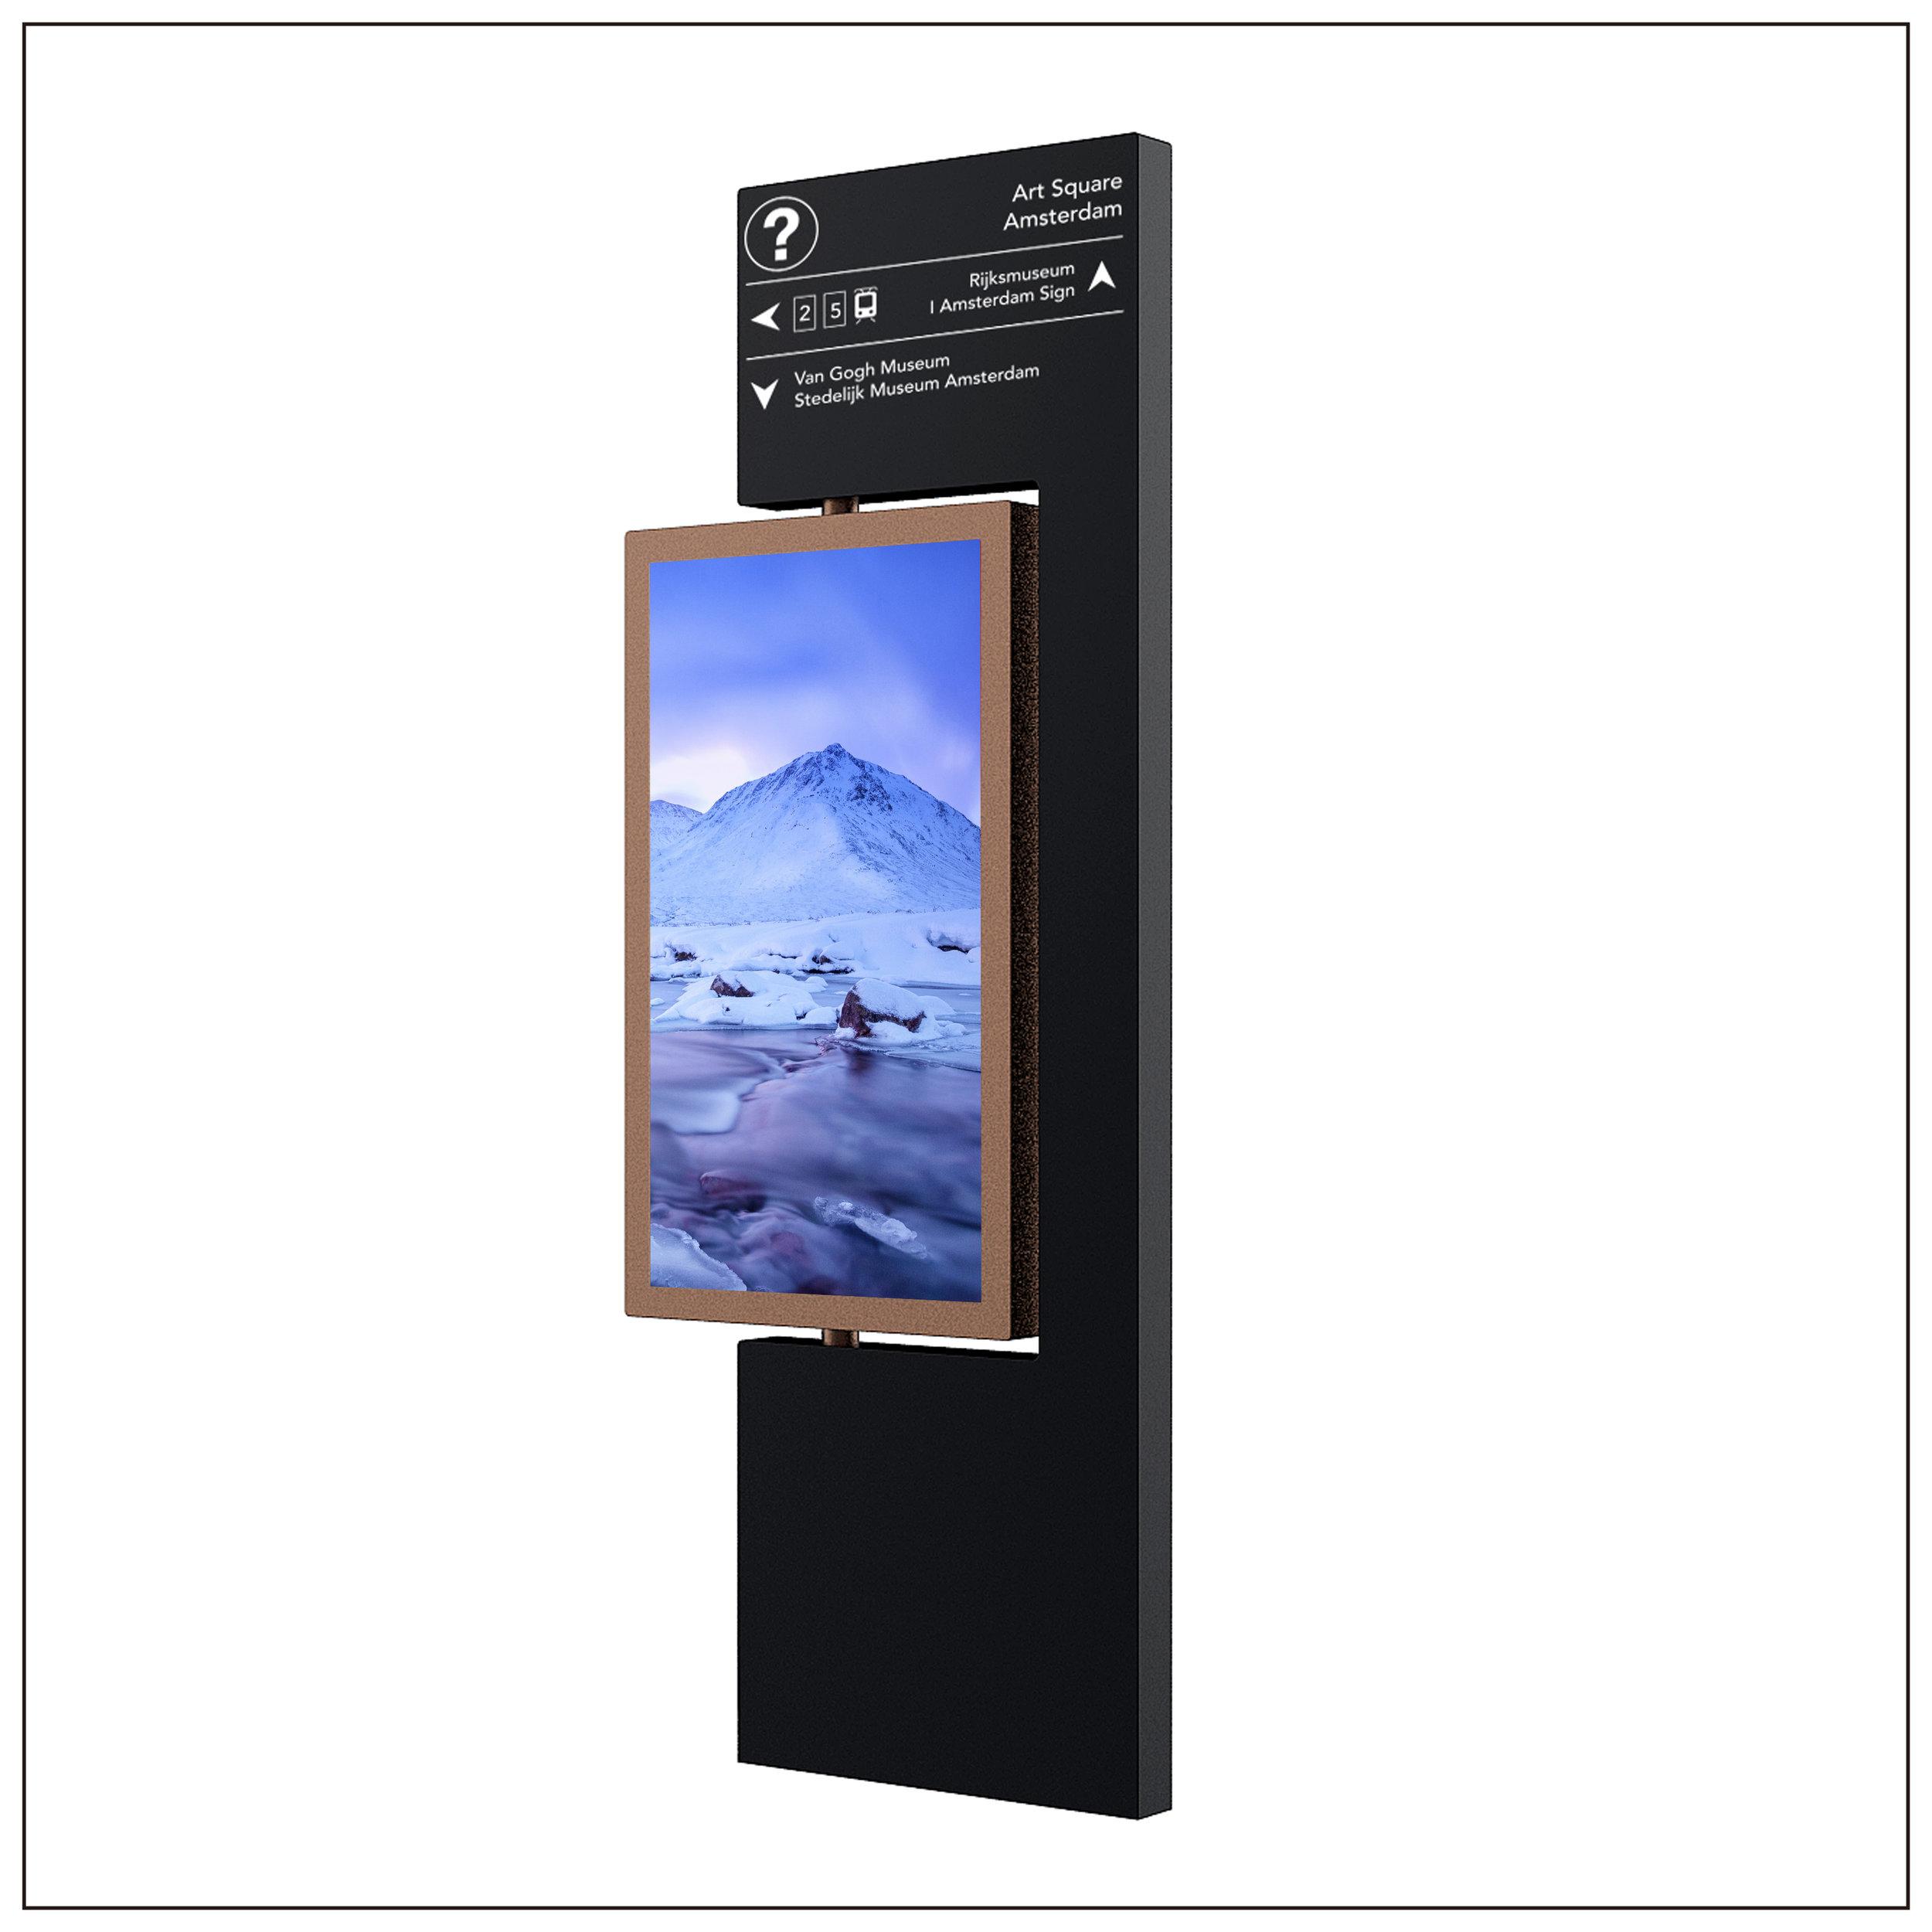 Wayfinding LCD Kiosk